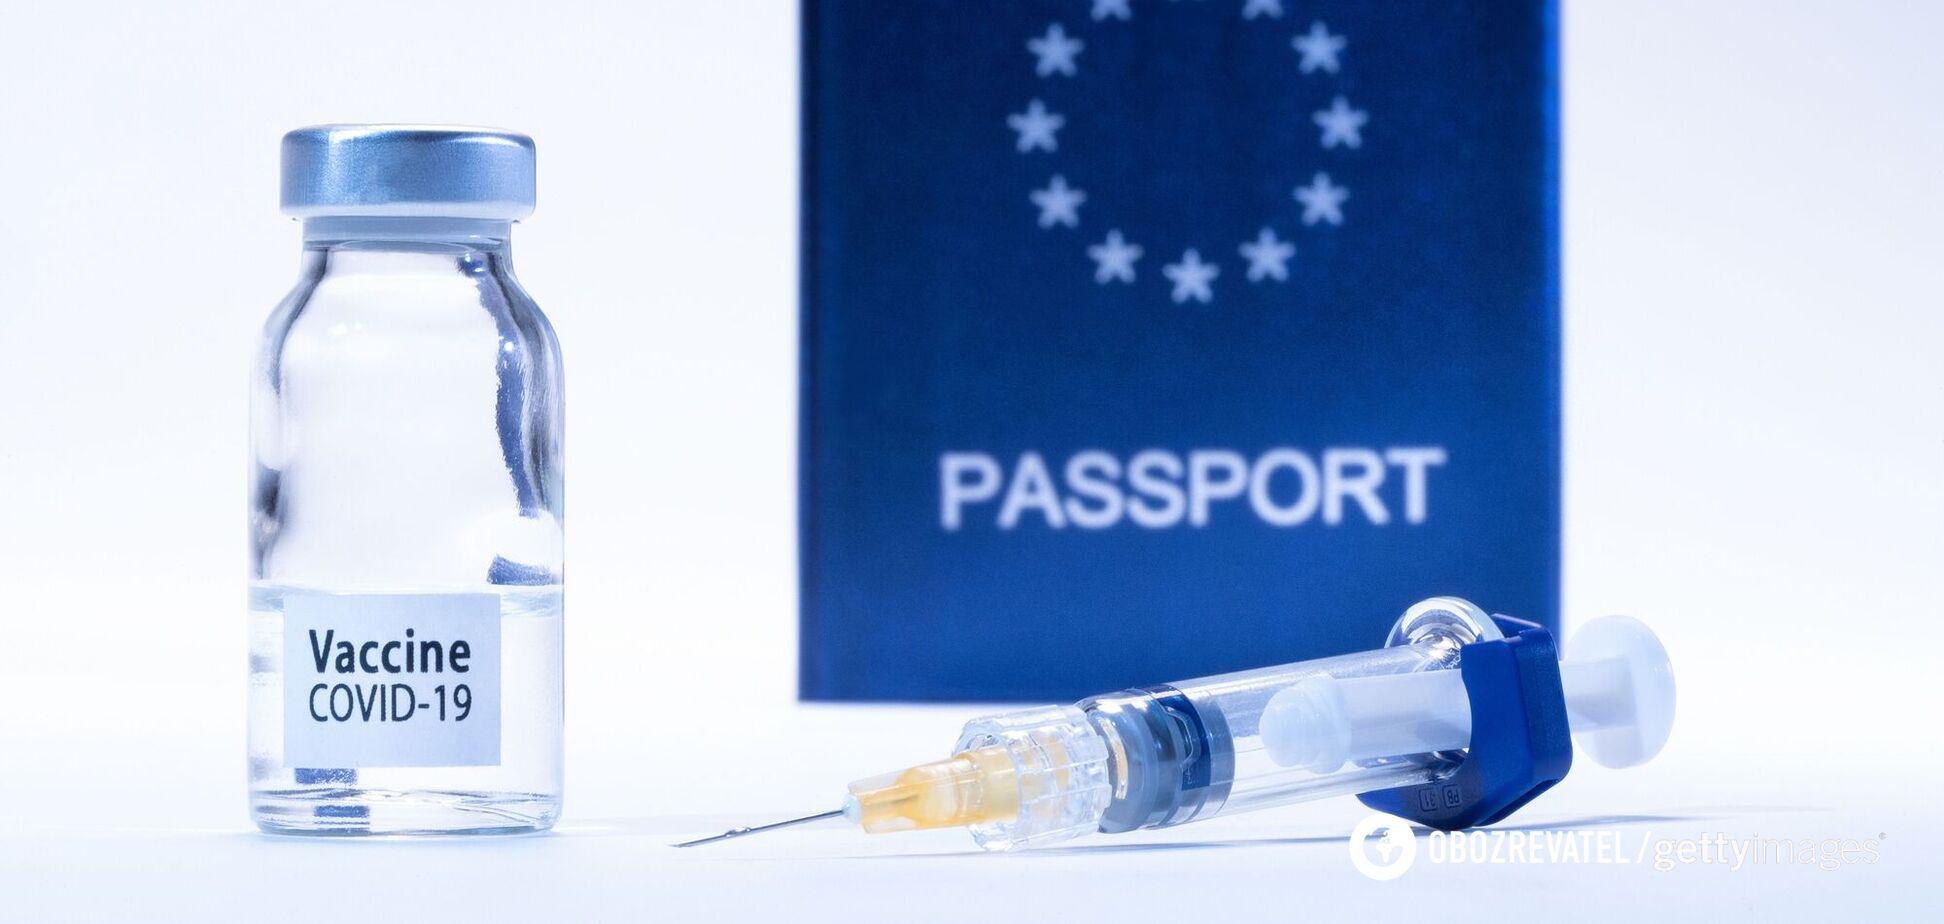 В ЄС остаточно узгодили COVID-сертифікати